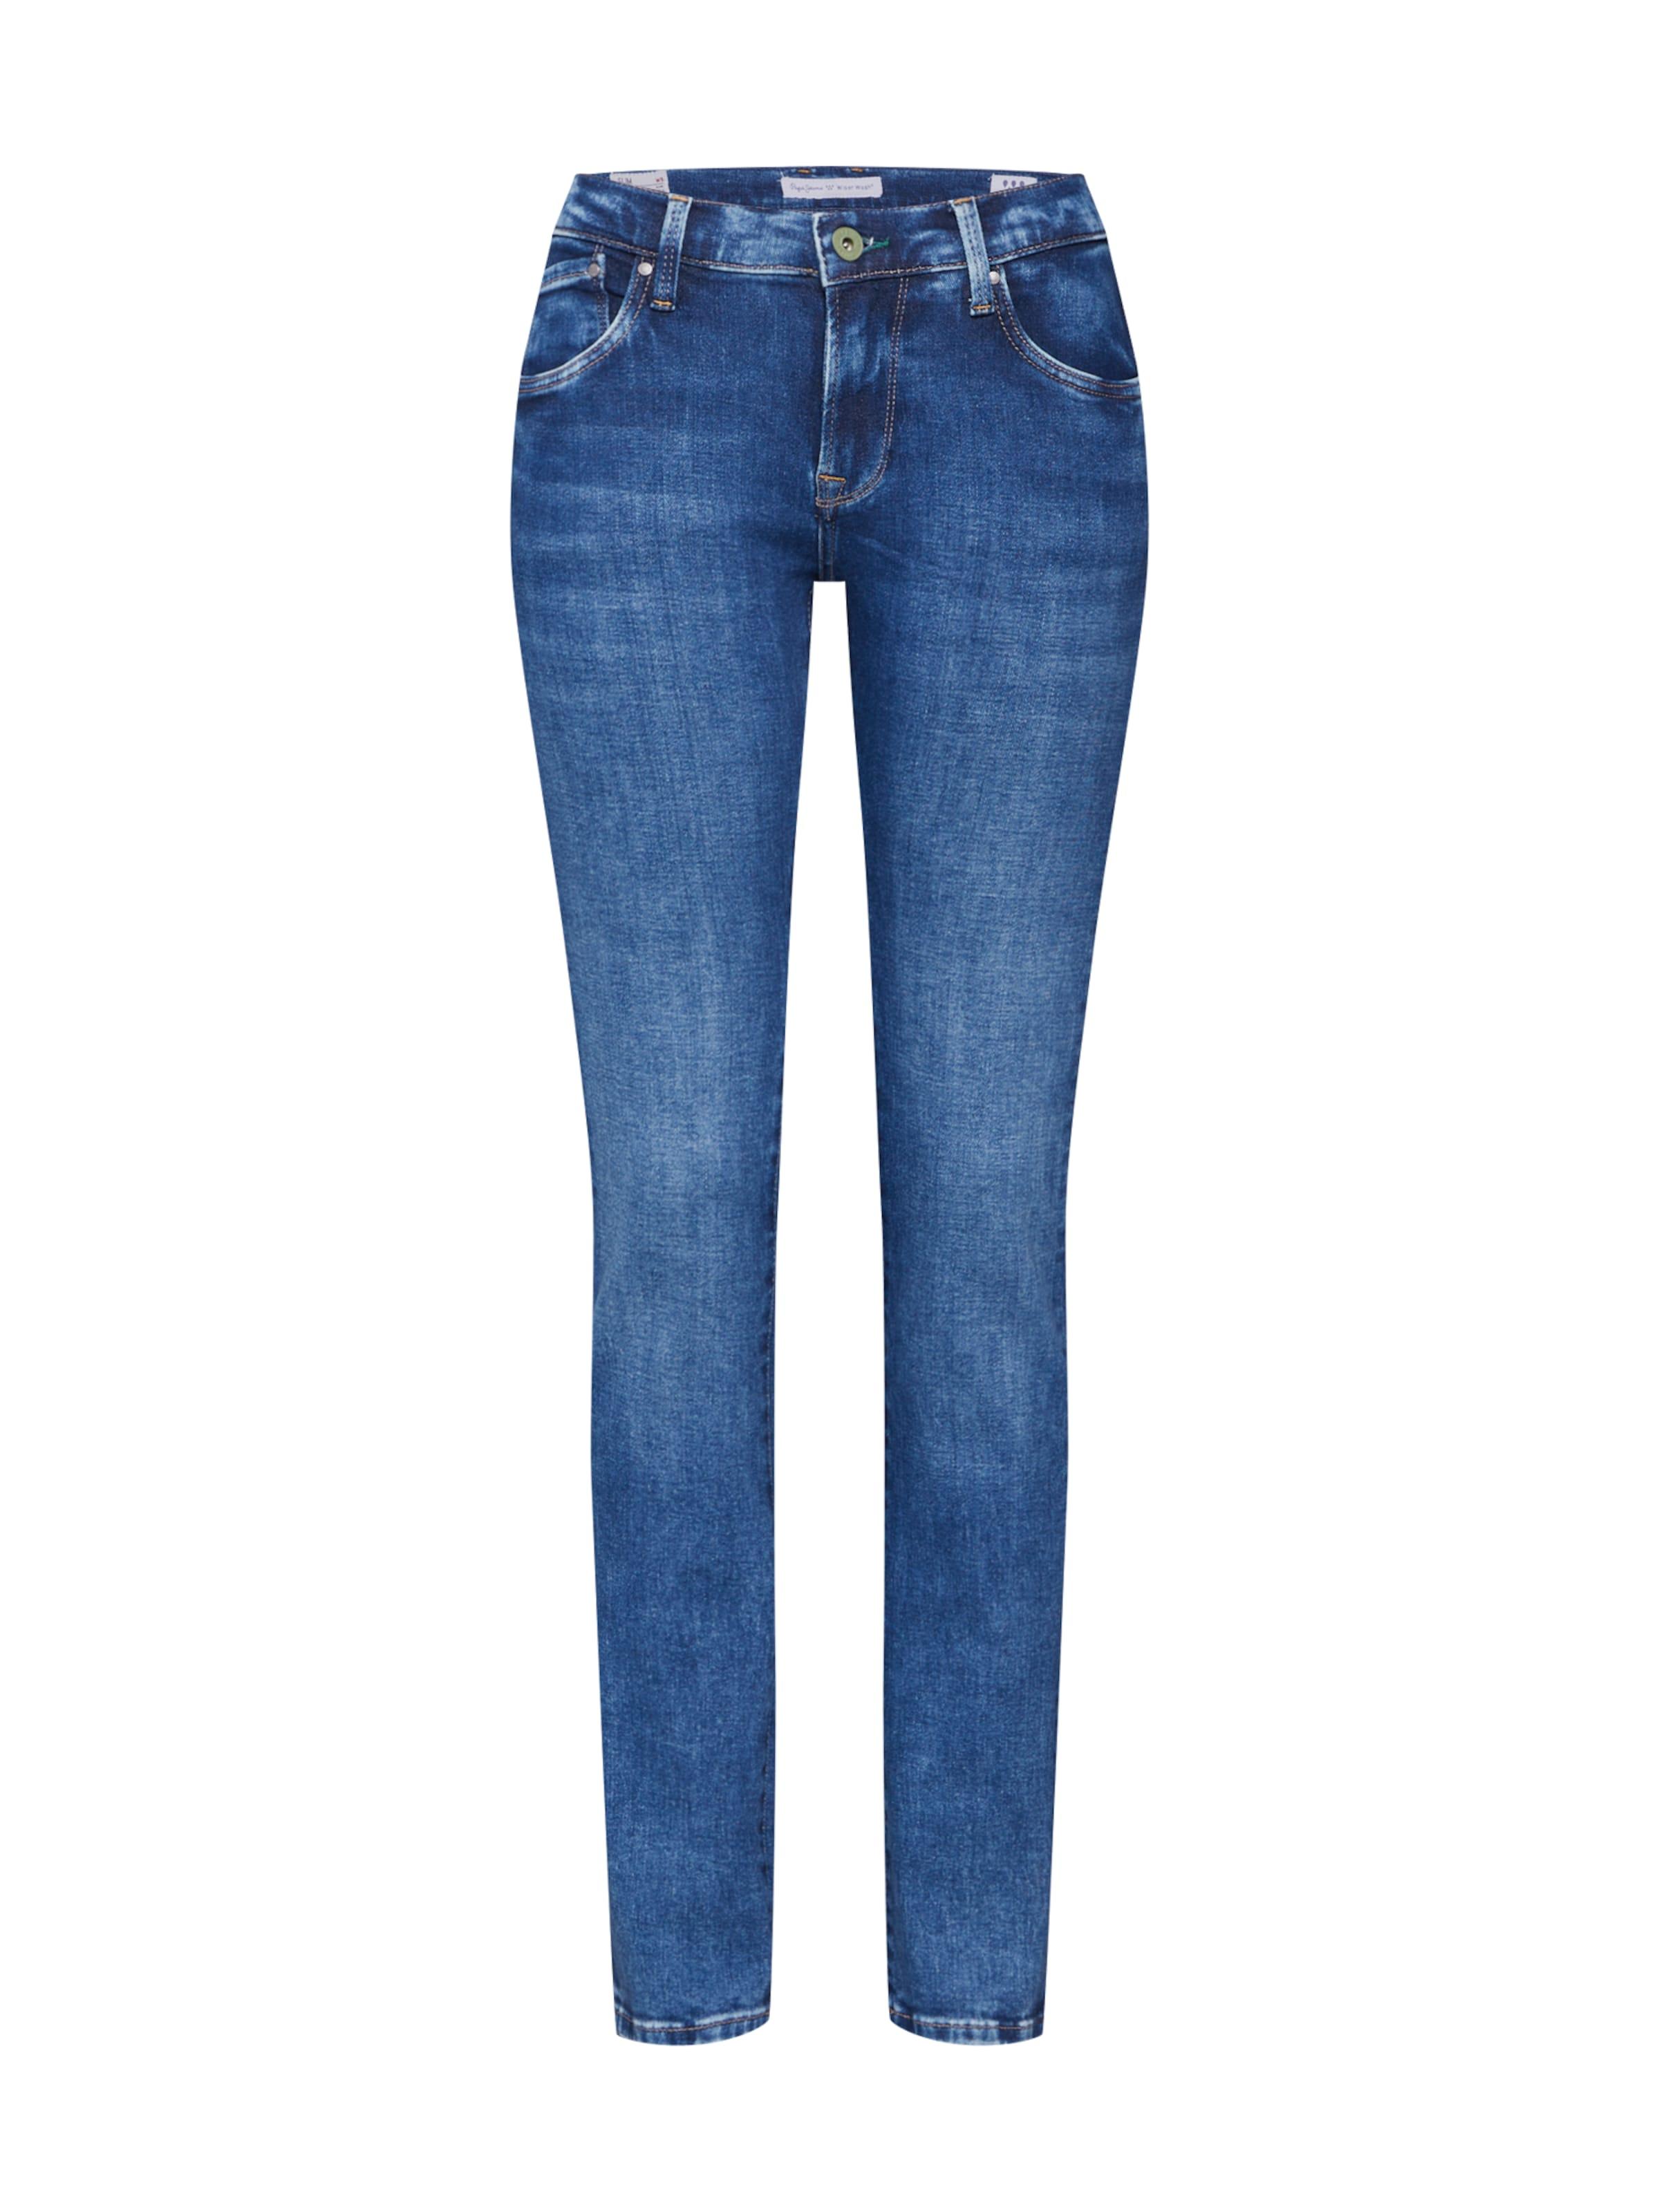 Denim Pepe En Jeans 'victoria' Jean Bleu IyY7gf6vb